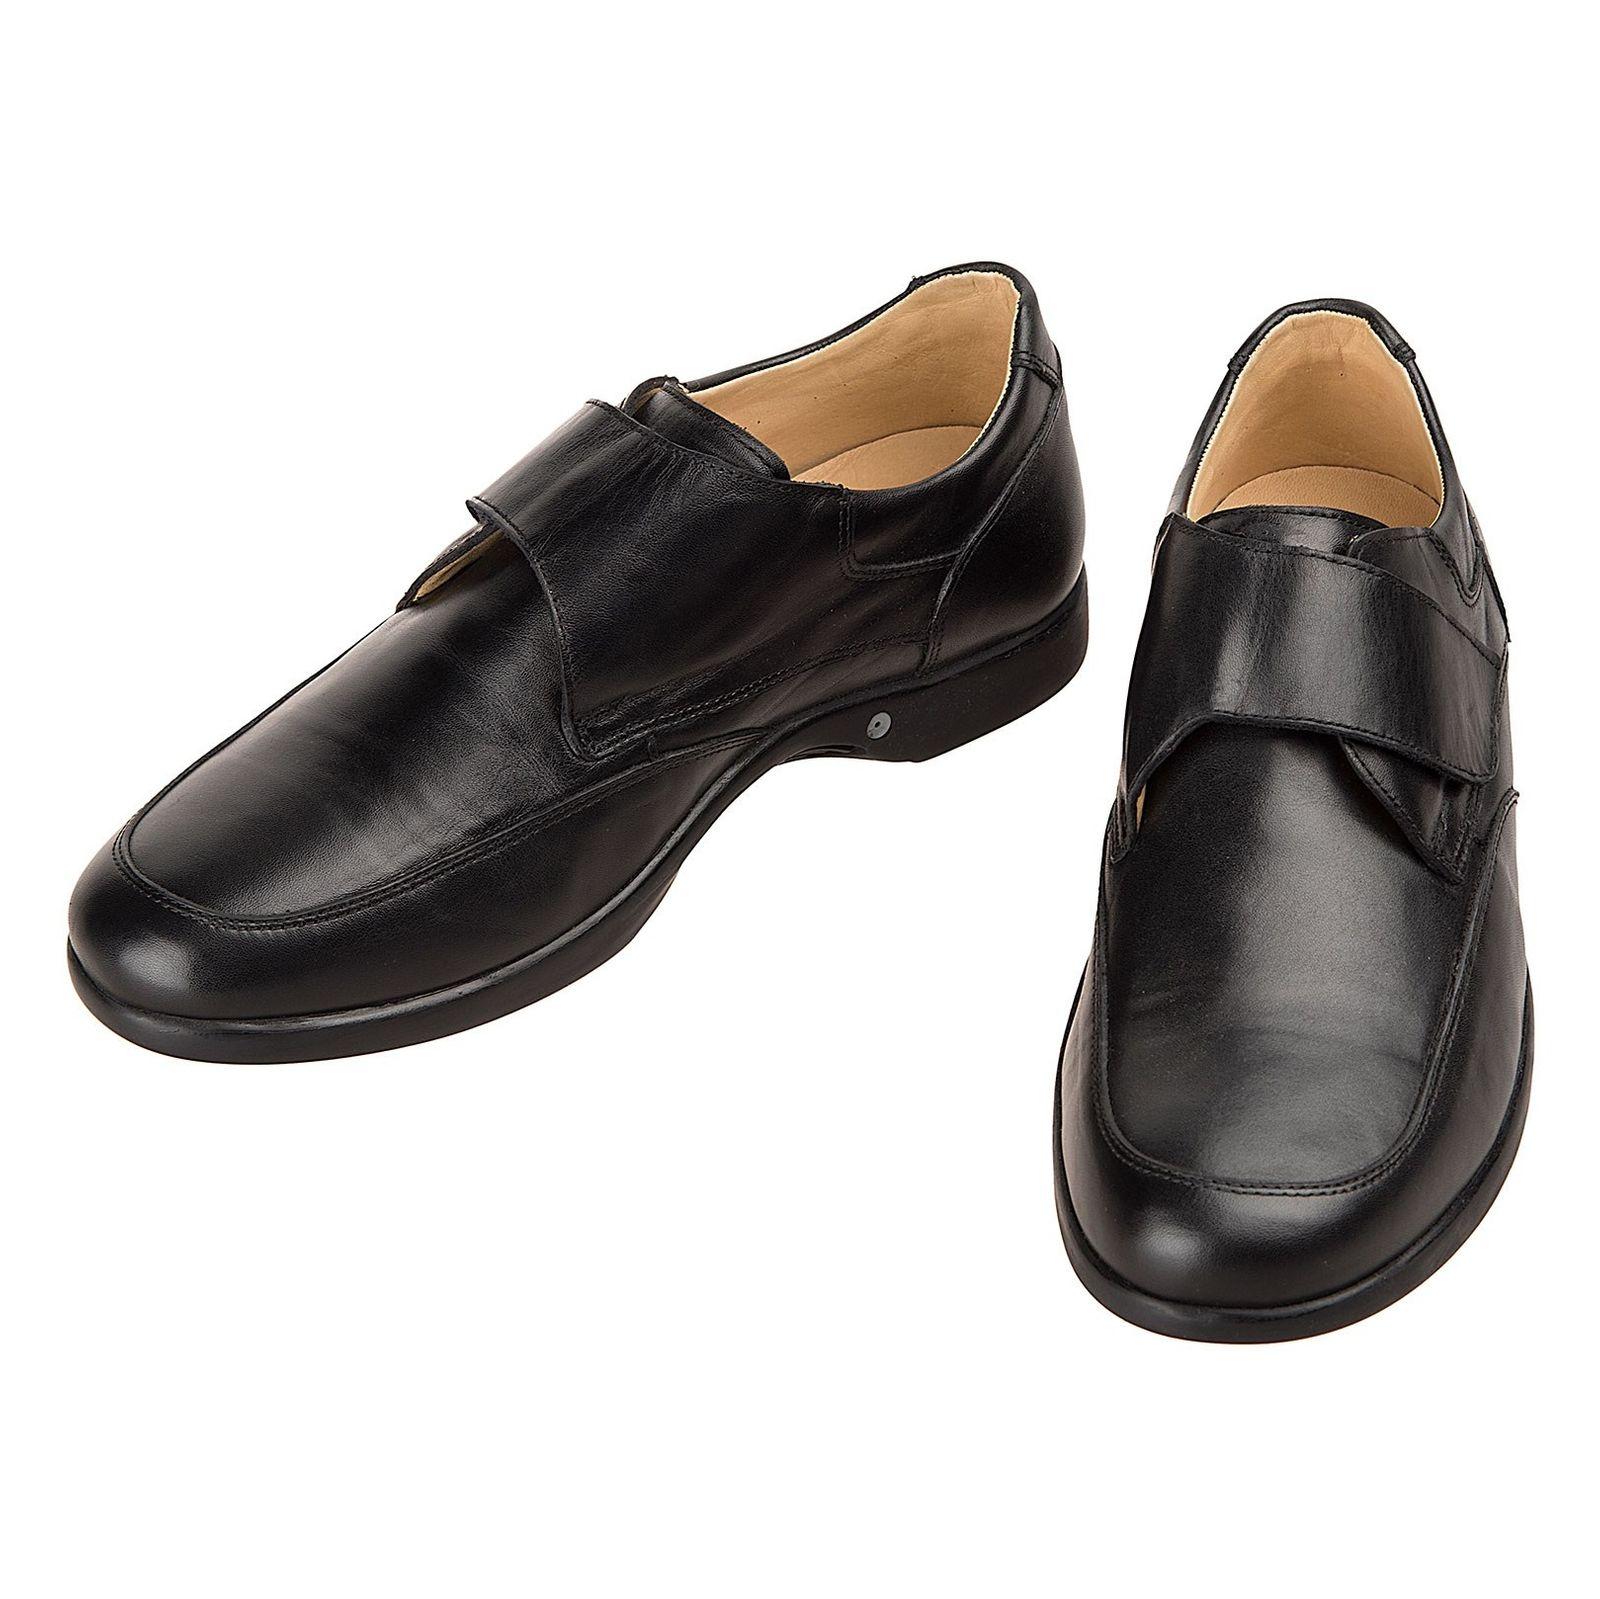 کفش اداری چرم مردانه - شهر چرم - مشکي - 4